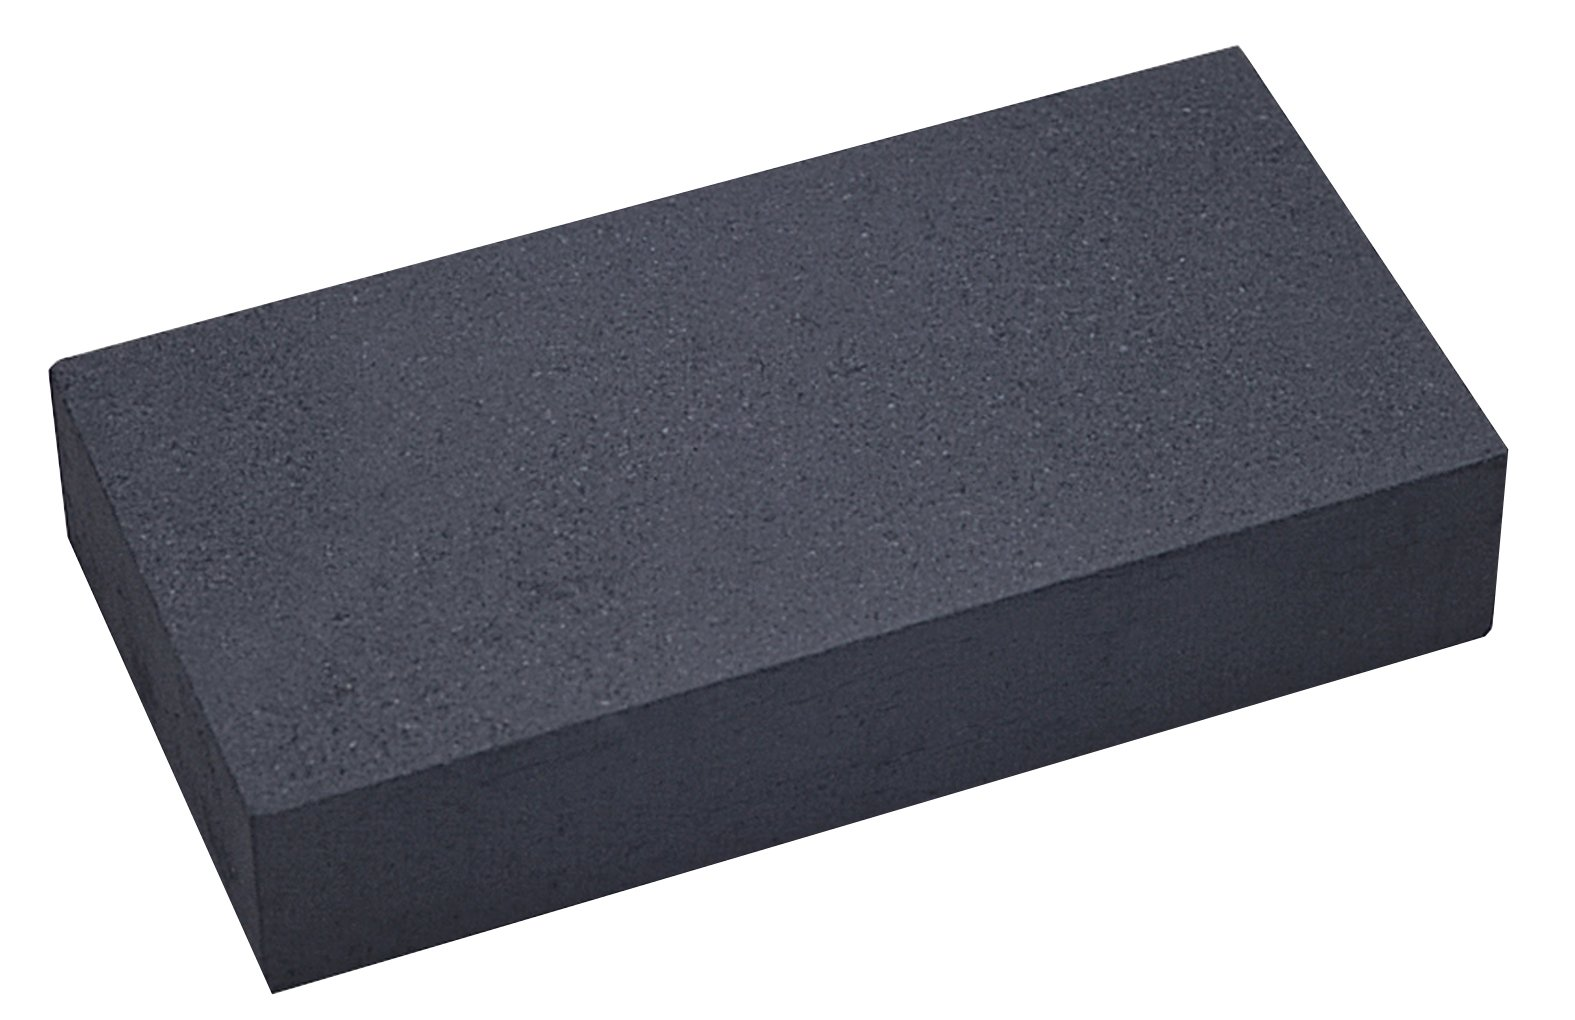 Hard Charcoal Block - 5-1/2'' x 2-3/4'' x 1-1/4'' Heat-Reflective Jewelry Making Repair Soldering Work Surface Tool